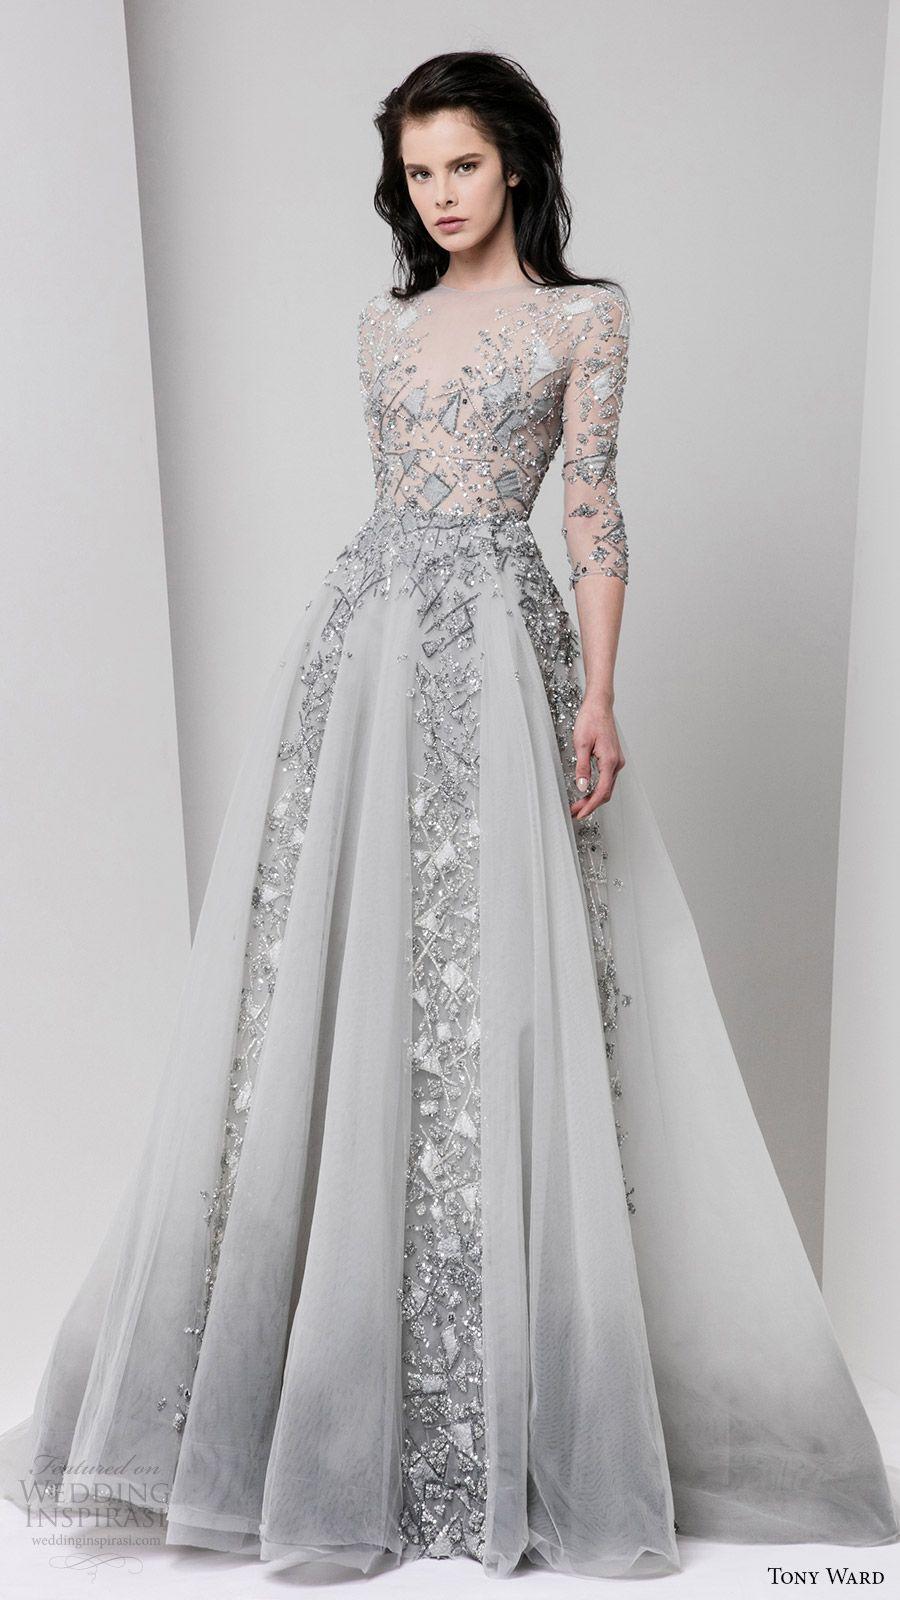 Tony Ward Fall 2016 Ready-to-Wear Dresses | Wedding, Sleeve and A line